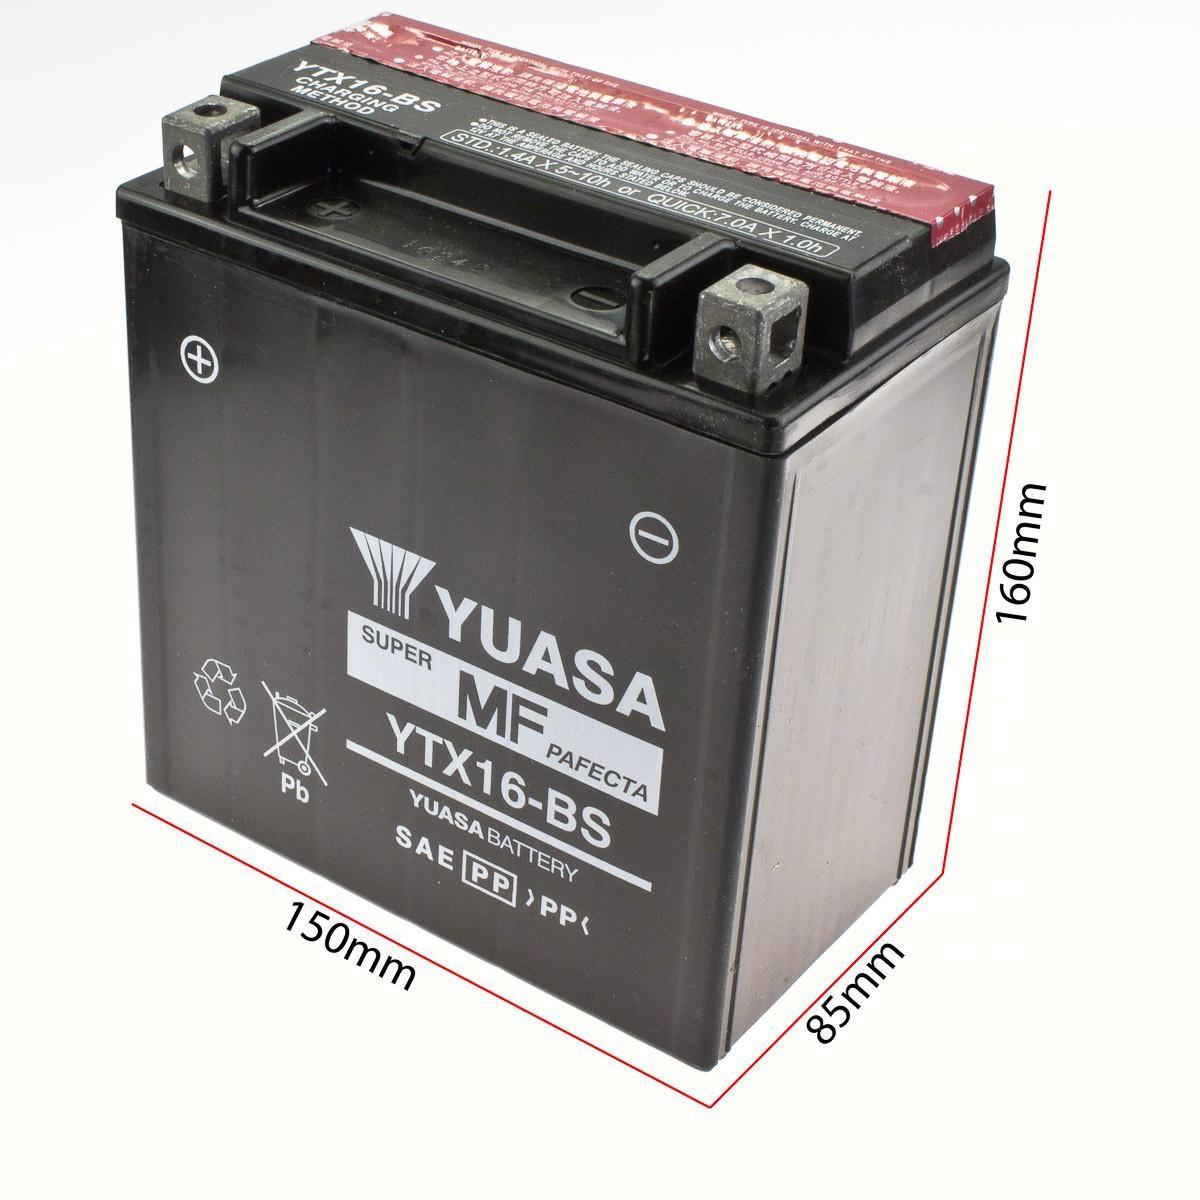 batterie yuasa ytx16 bs din51492 150x87x161mm elektronik batterien. Black Bedroom Furniture Sets. Home Design Ideas